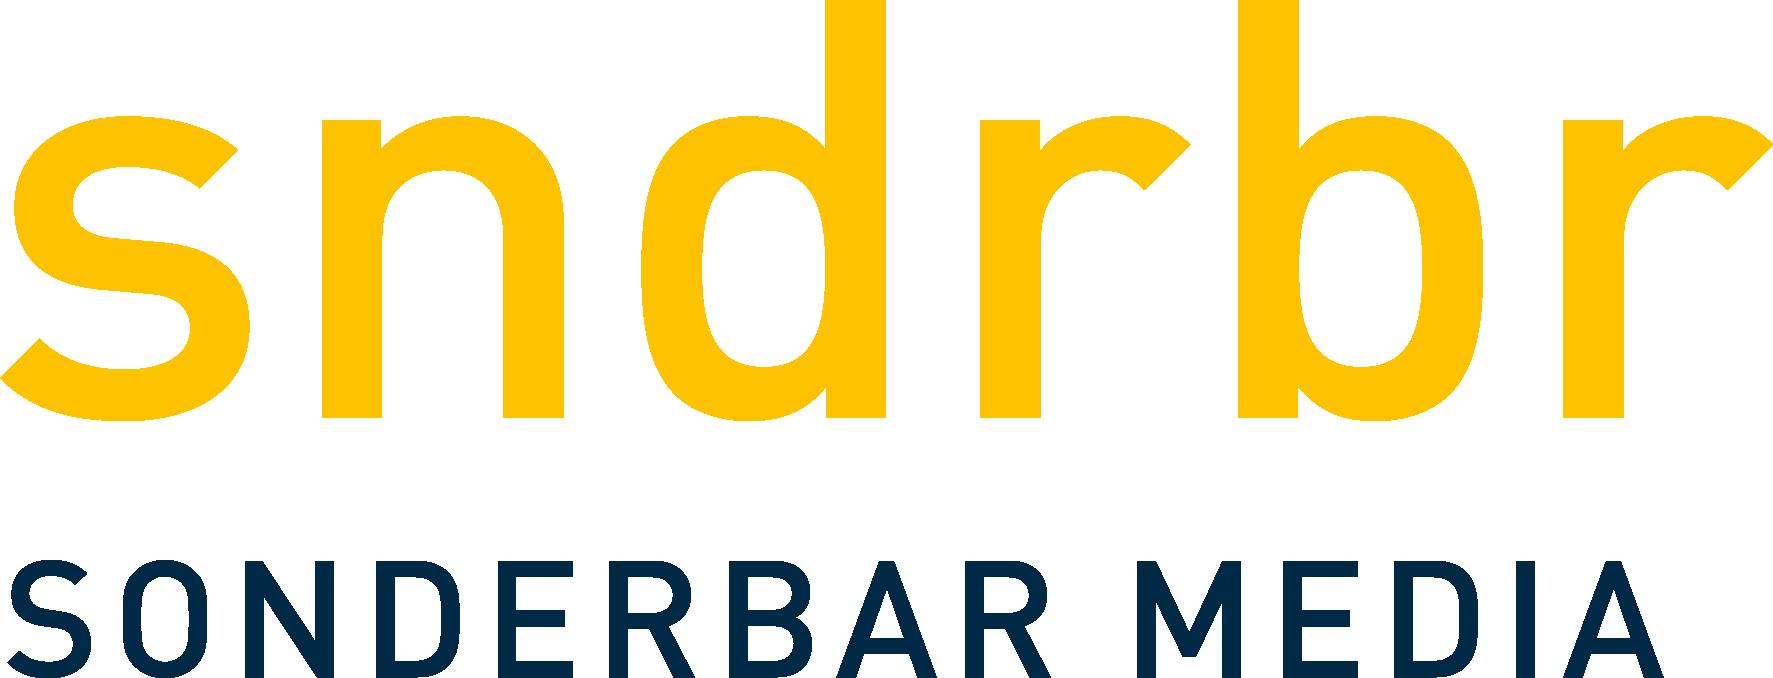 Sonderbar Media GmbH